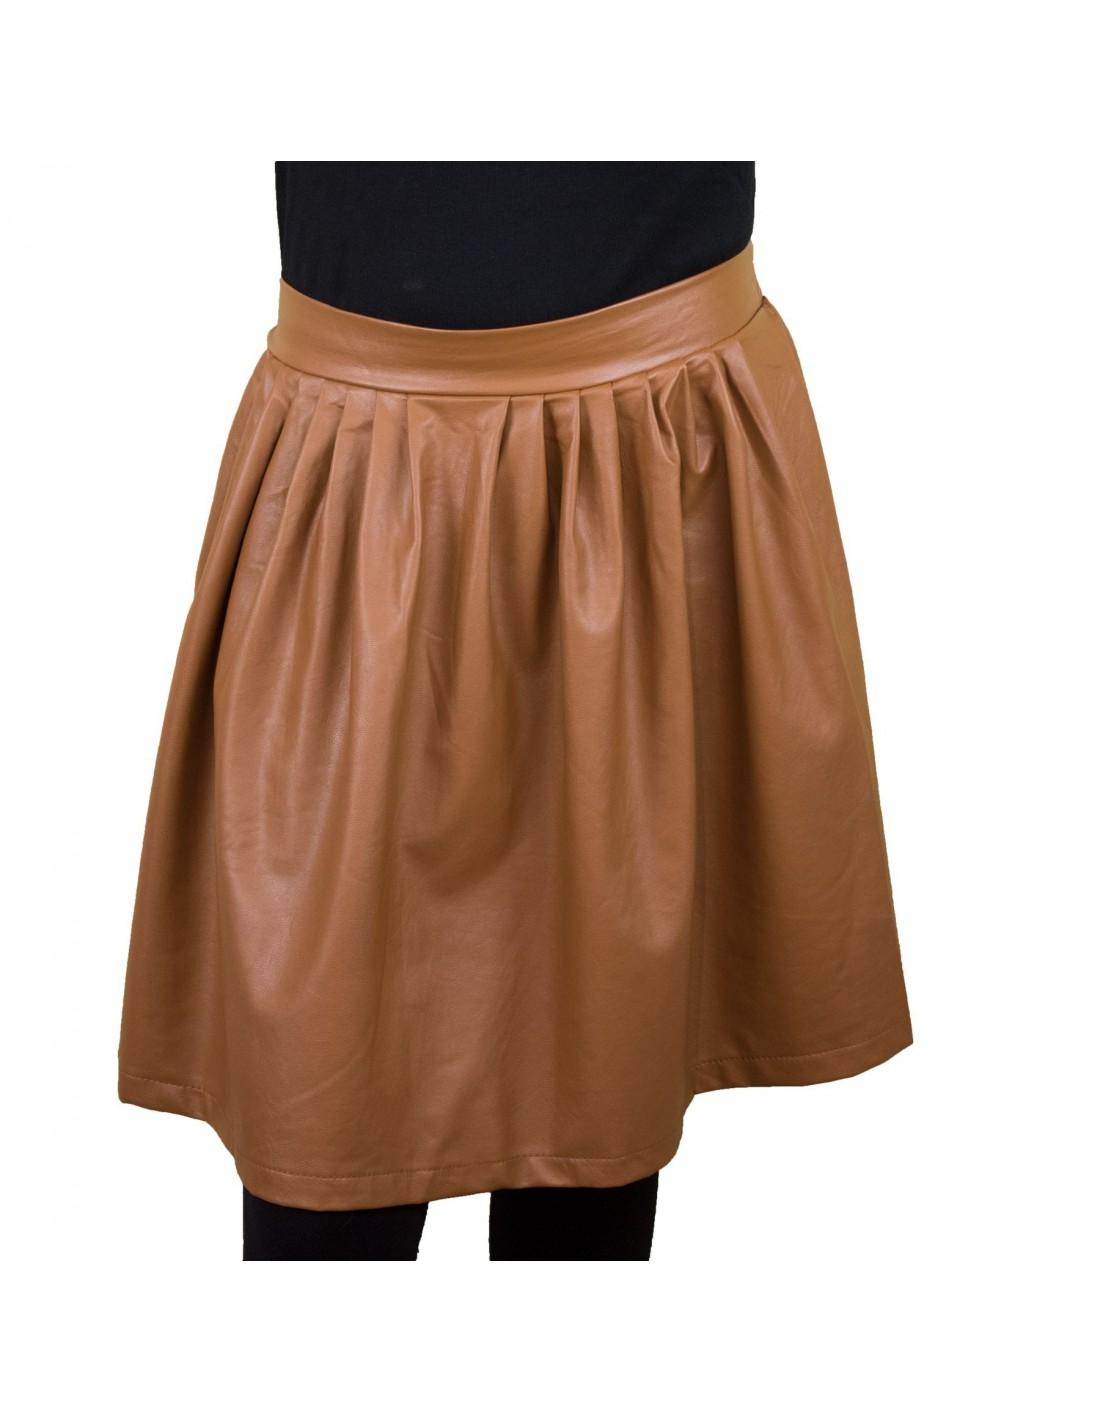 jupe patineuse aspect cuir taille lastique. Black Bedroom Furniture Sets. Home Design Ideas